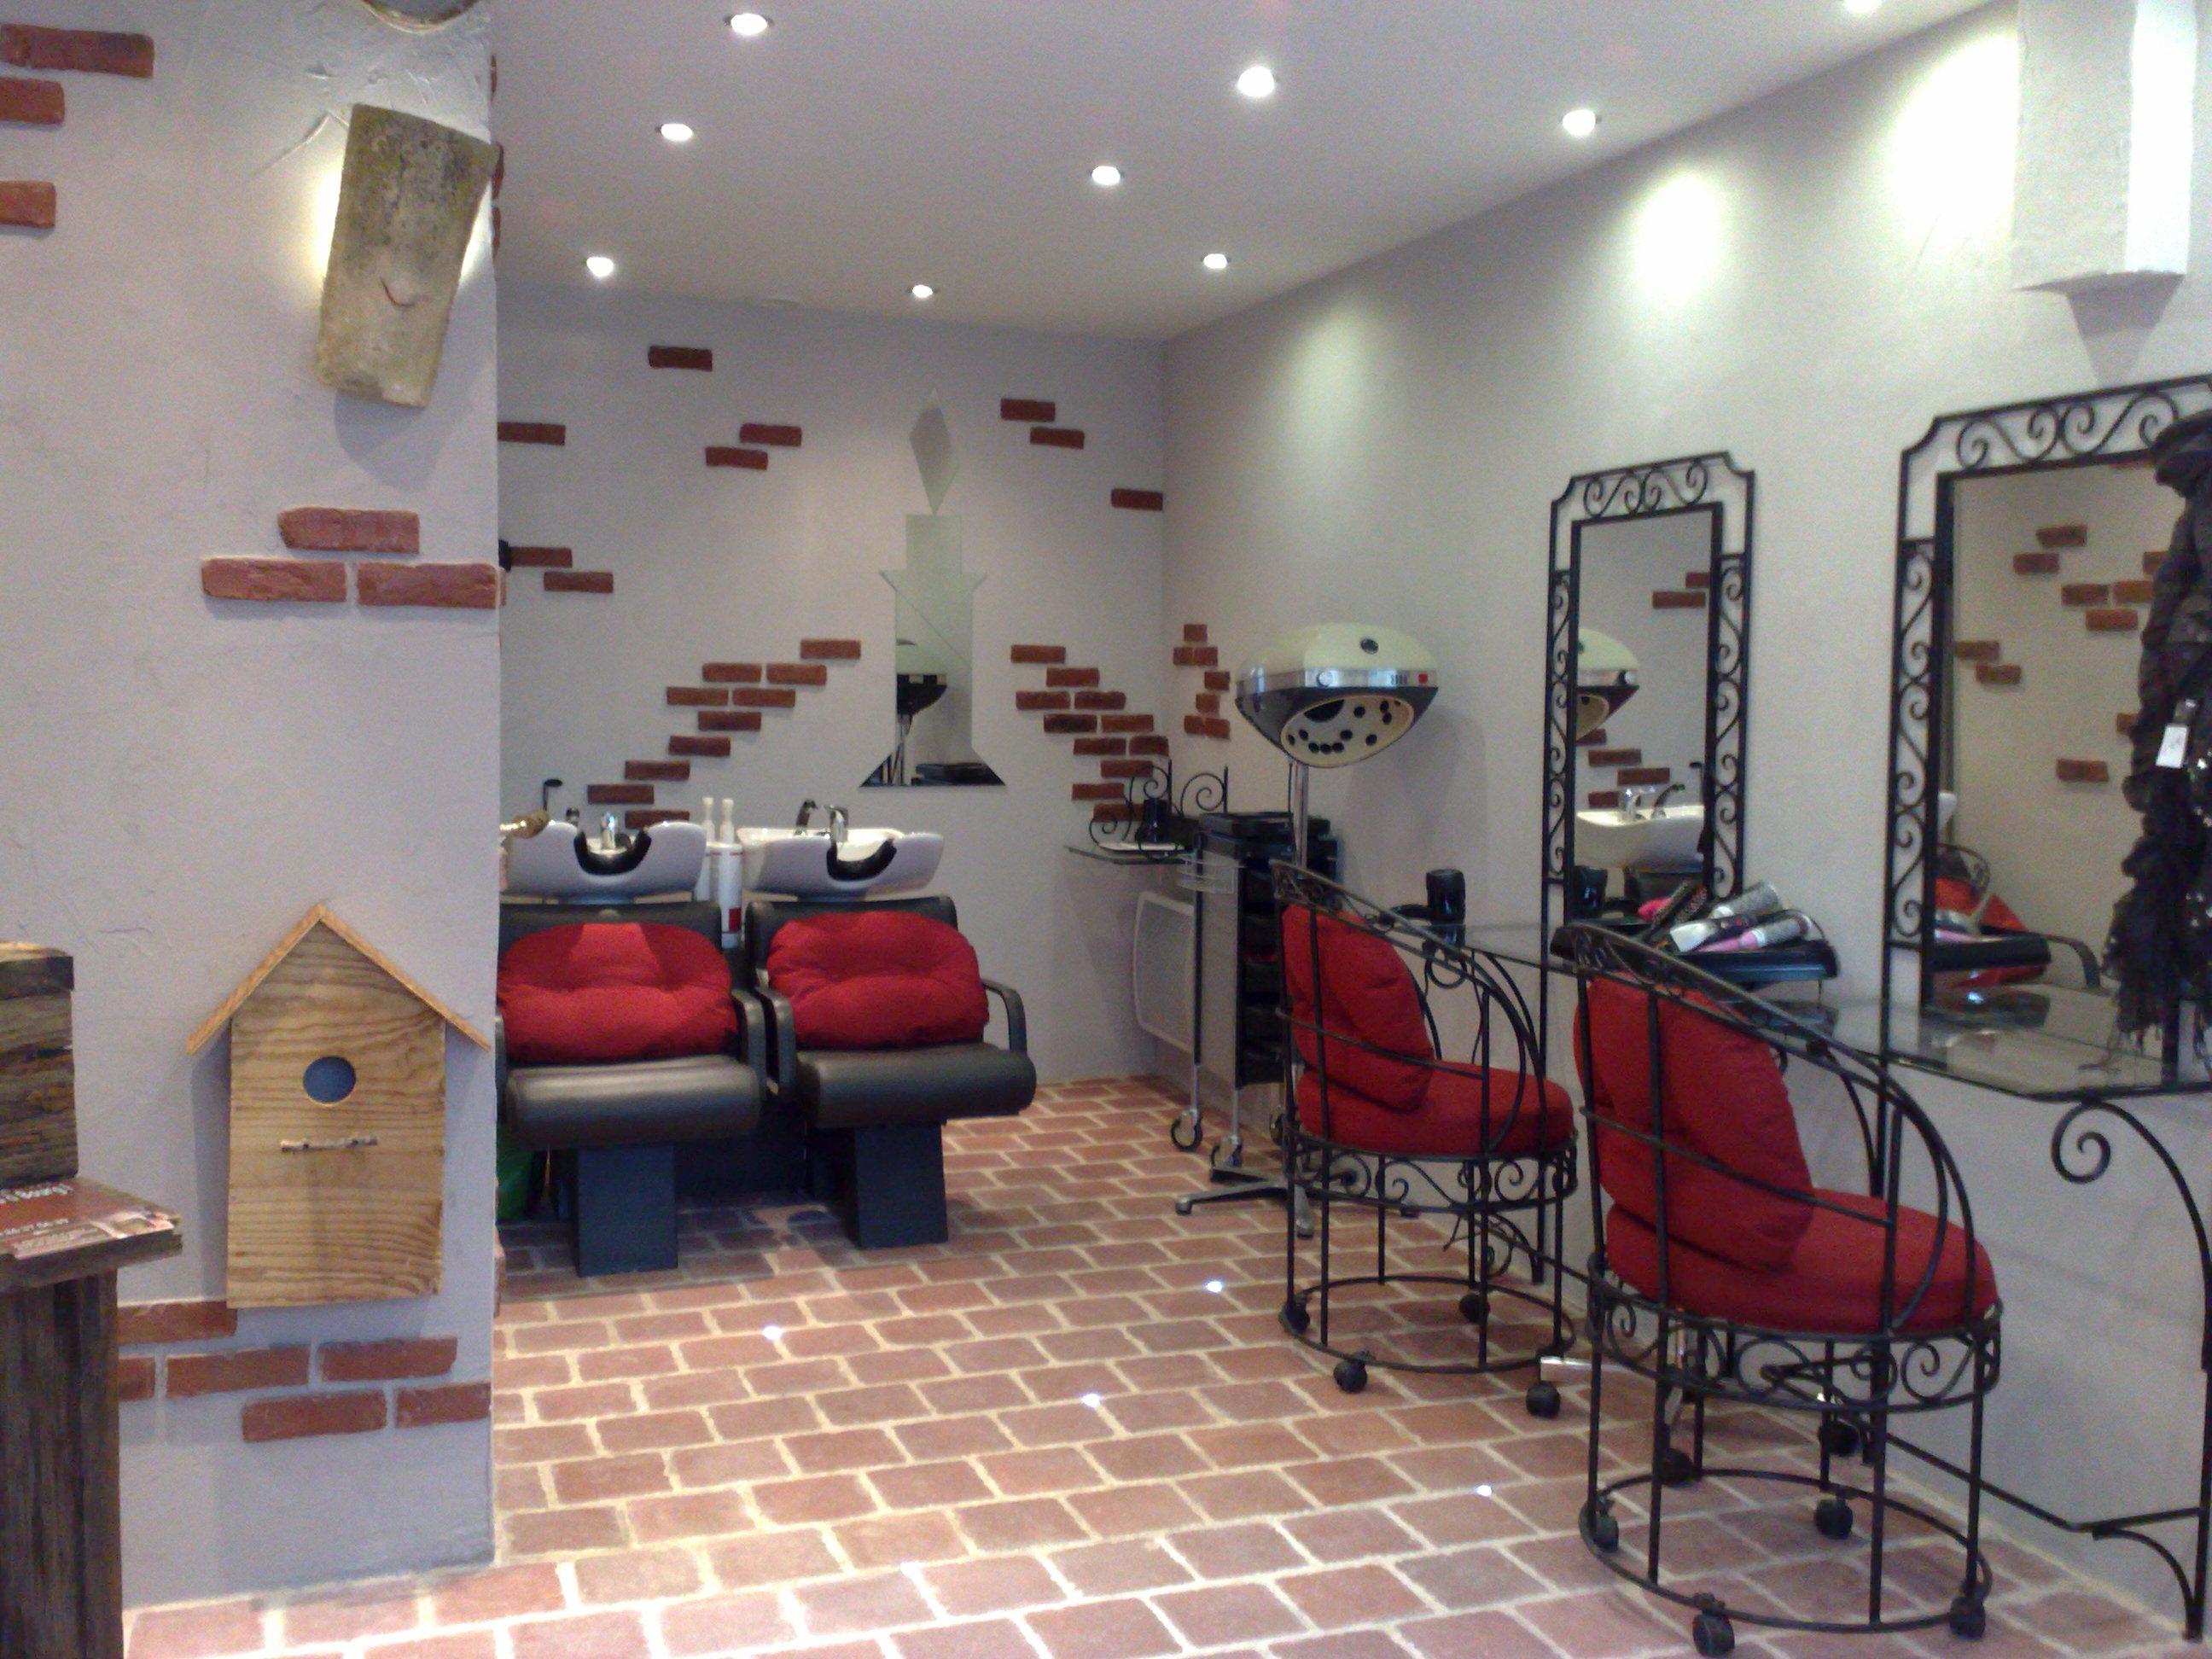 Anais coiffure bourg en bresse avis tarifs horaires t l phone - Salon de coiffure bourg en bresse ...